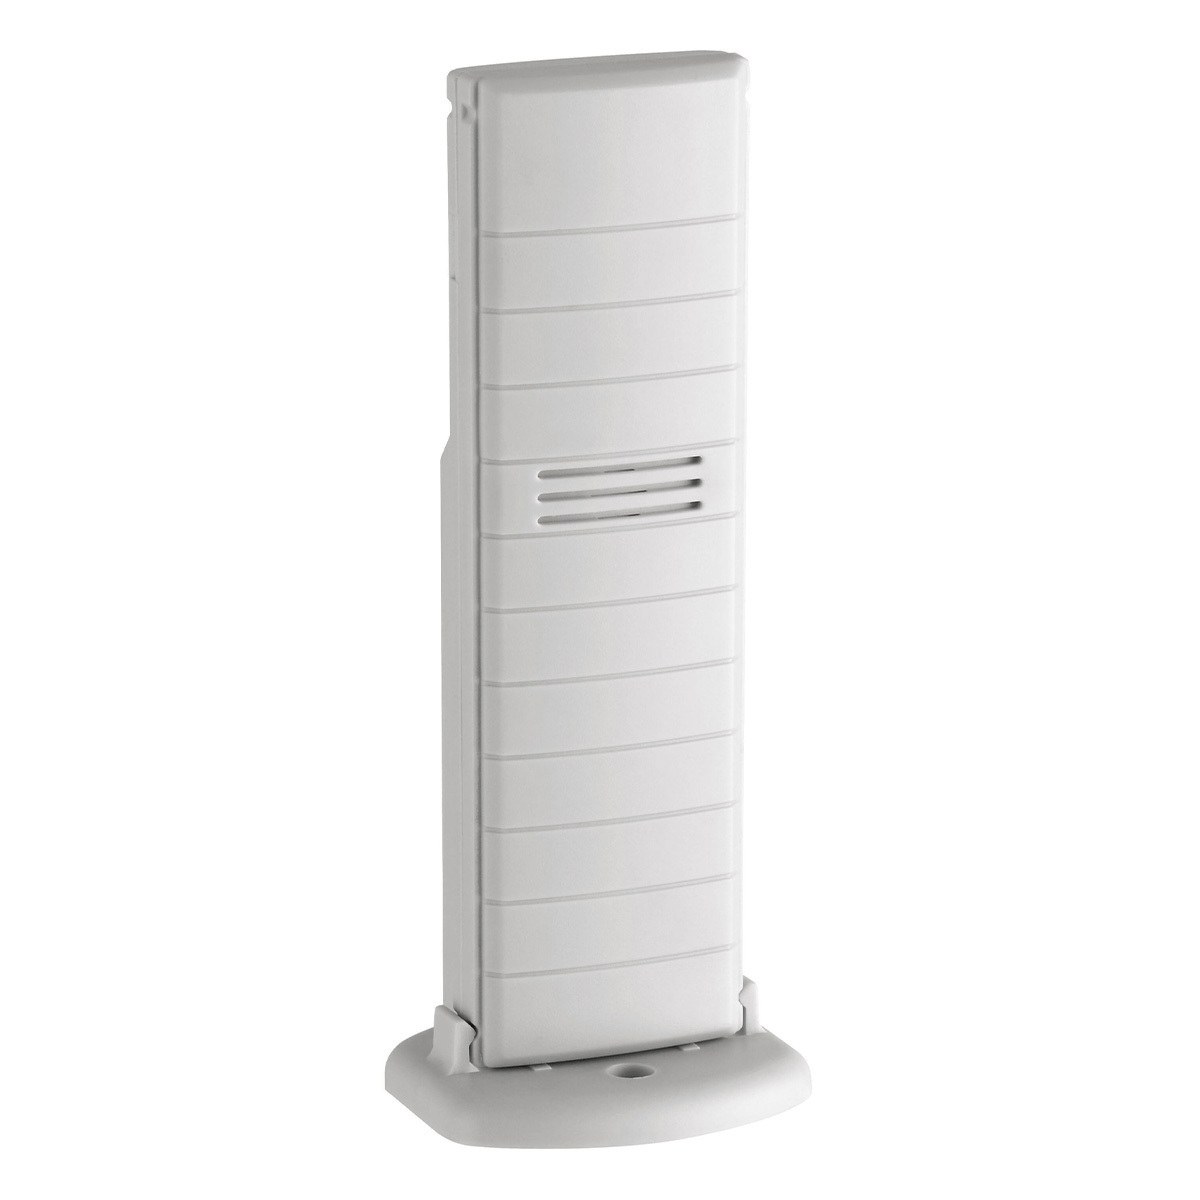 30-3159-it-temperatursender-1200x1200px.jpg